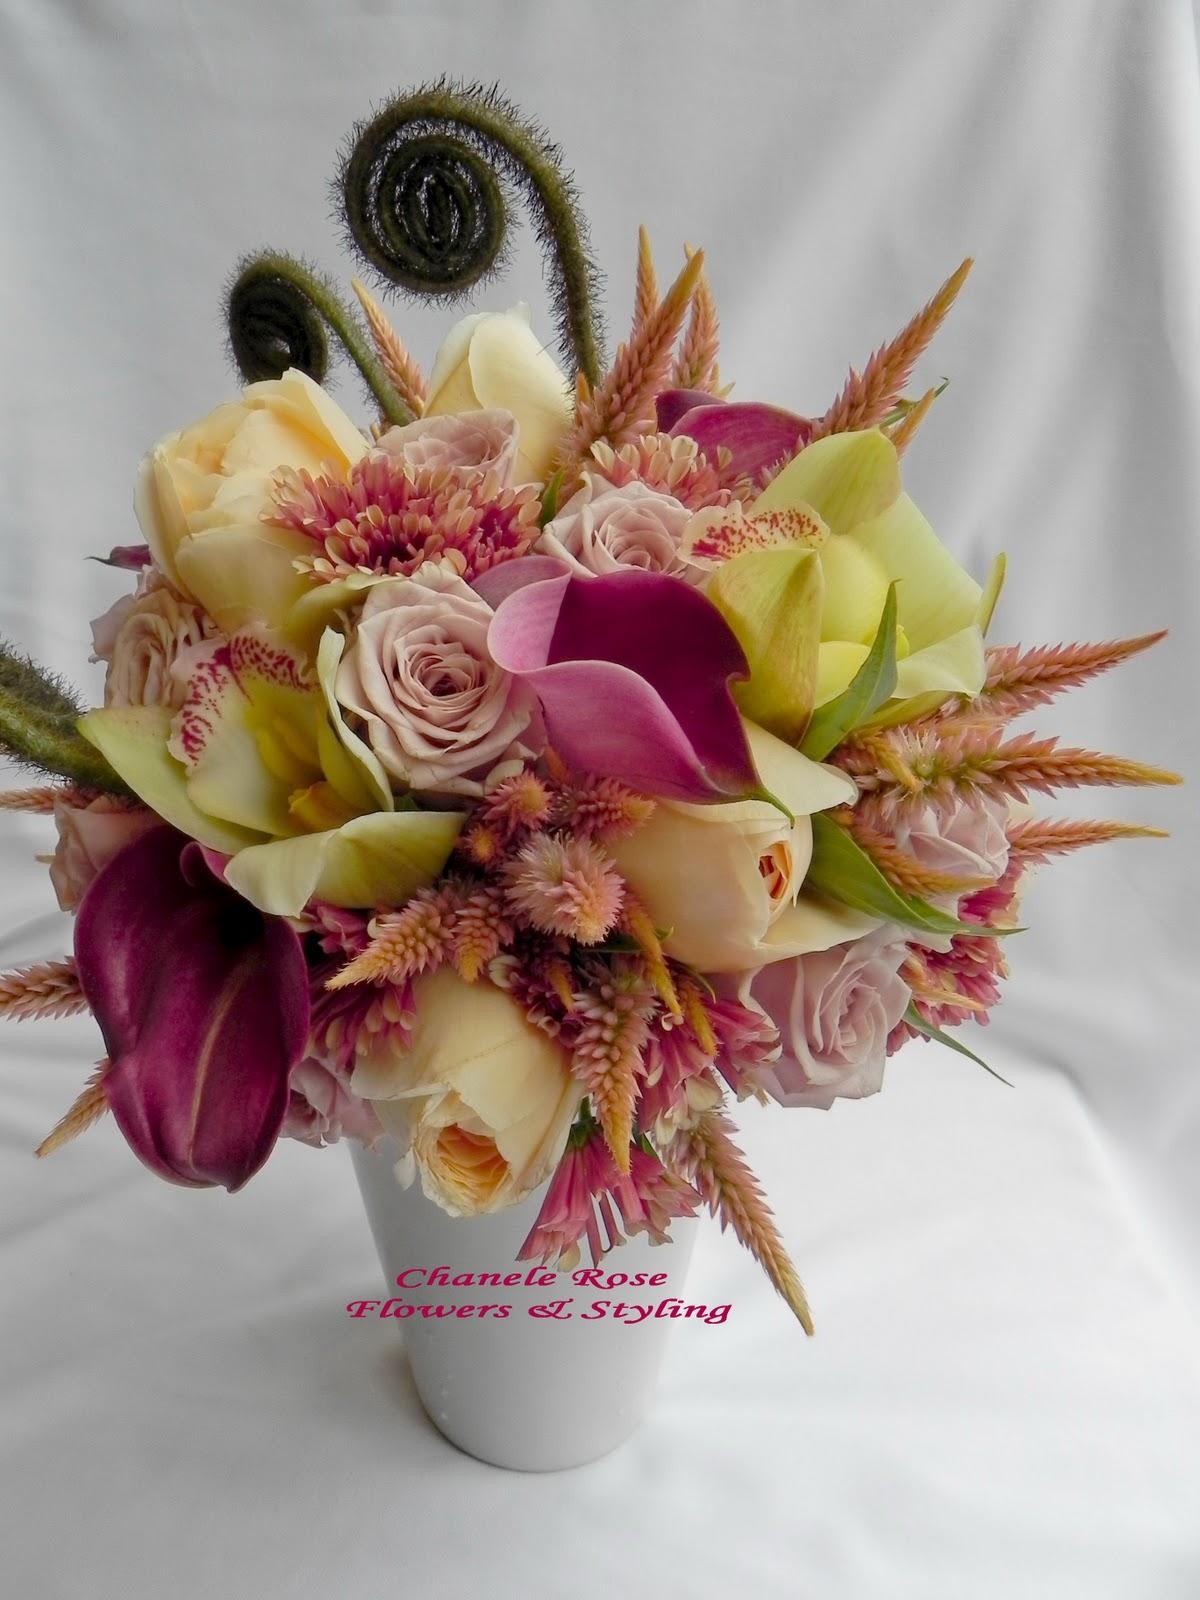 Chanele rose flowers blog sydney wedding stylist florist vintage themed bridal bouquet izmirmasajfo